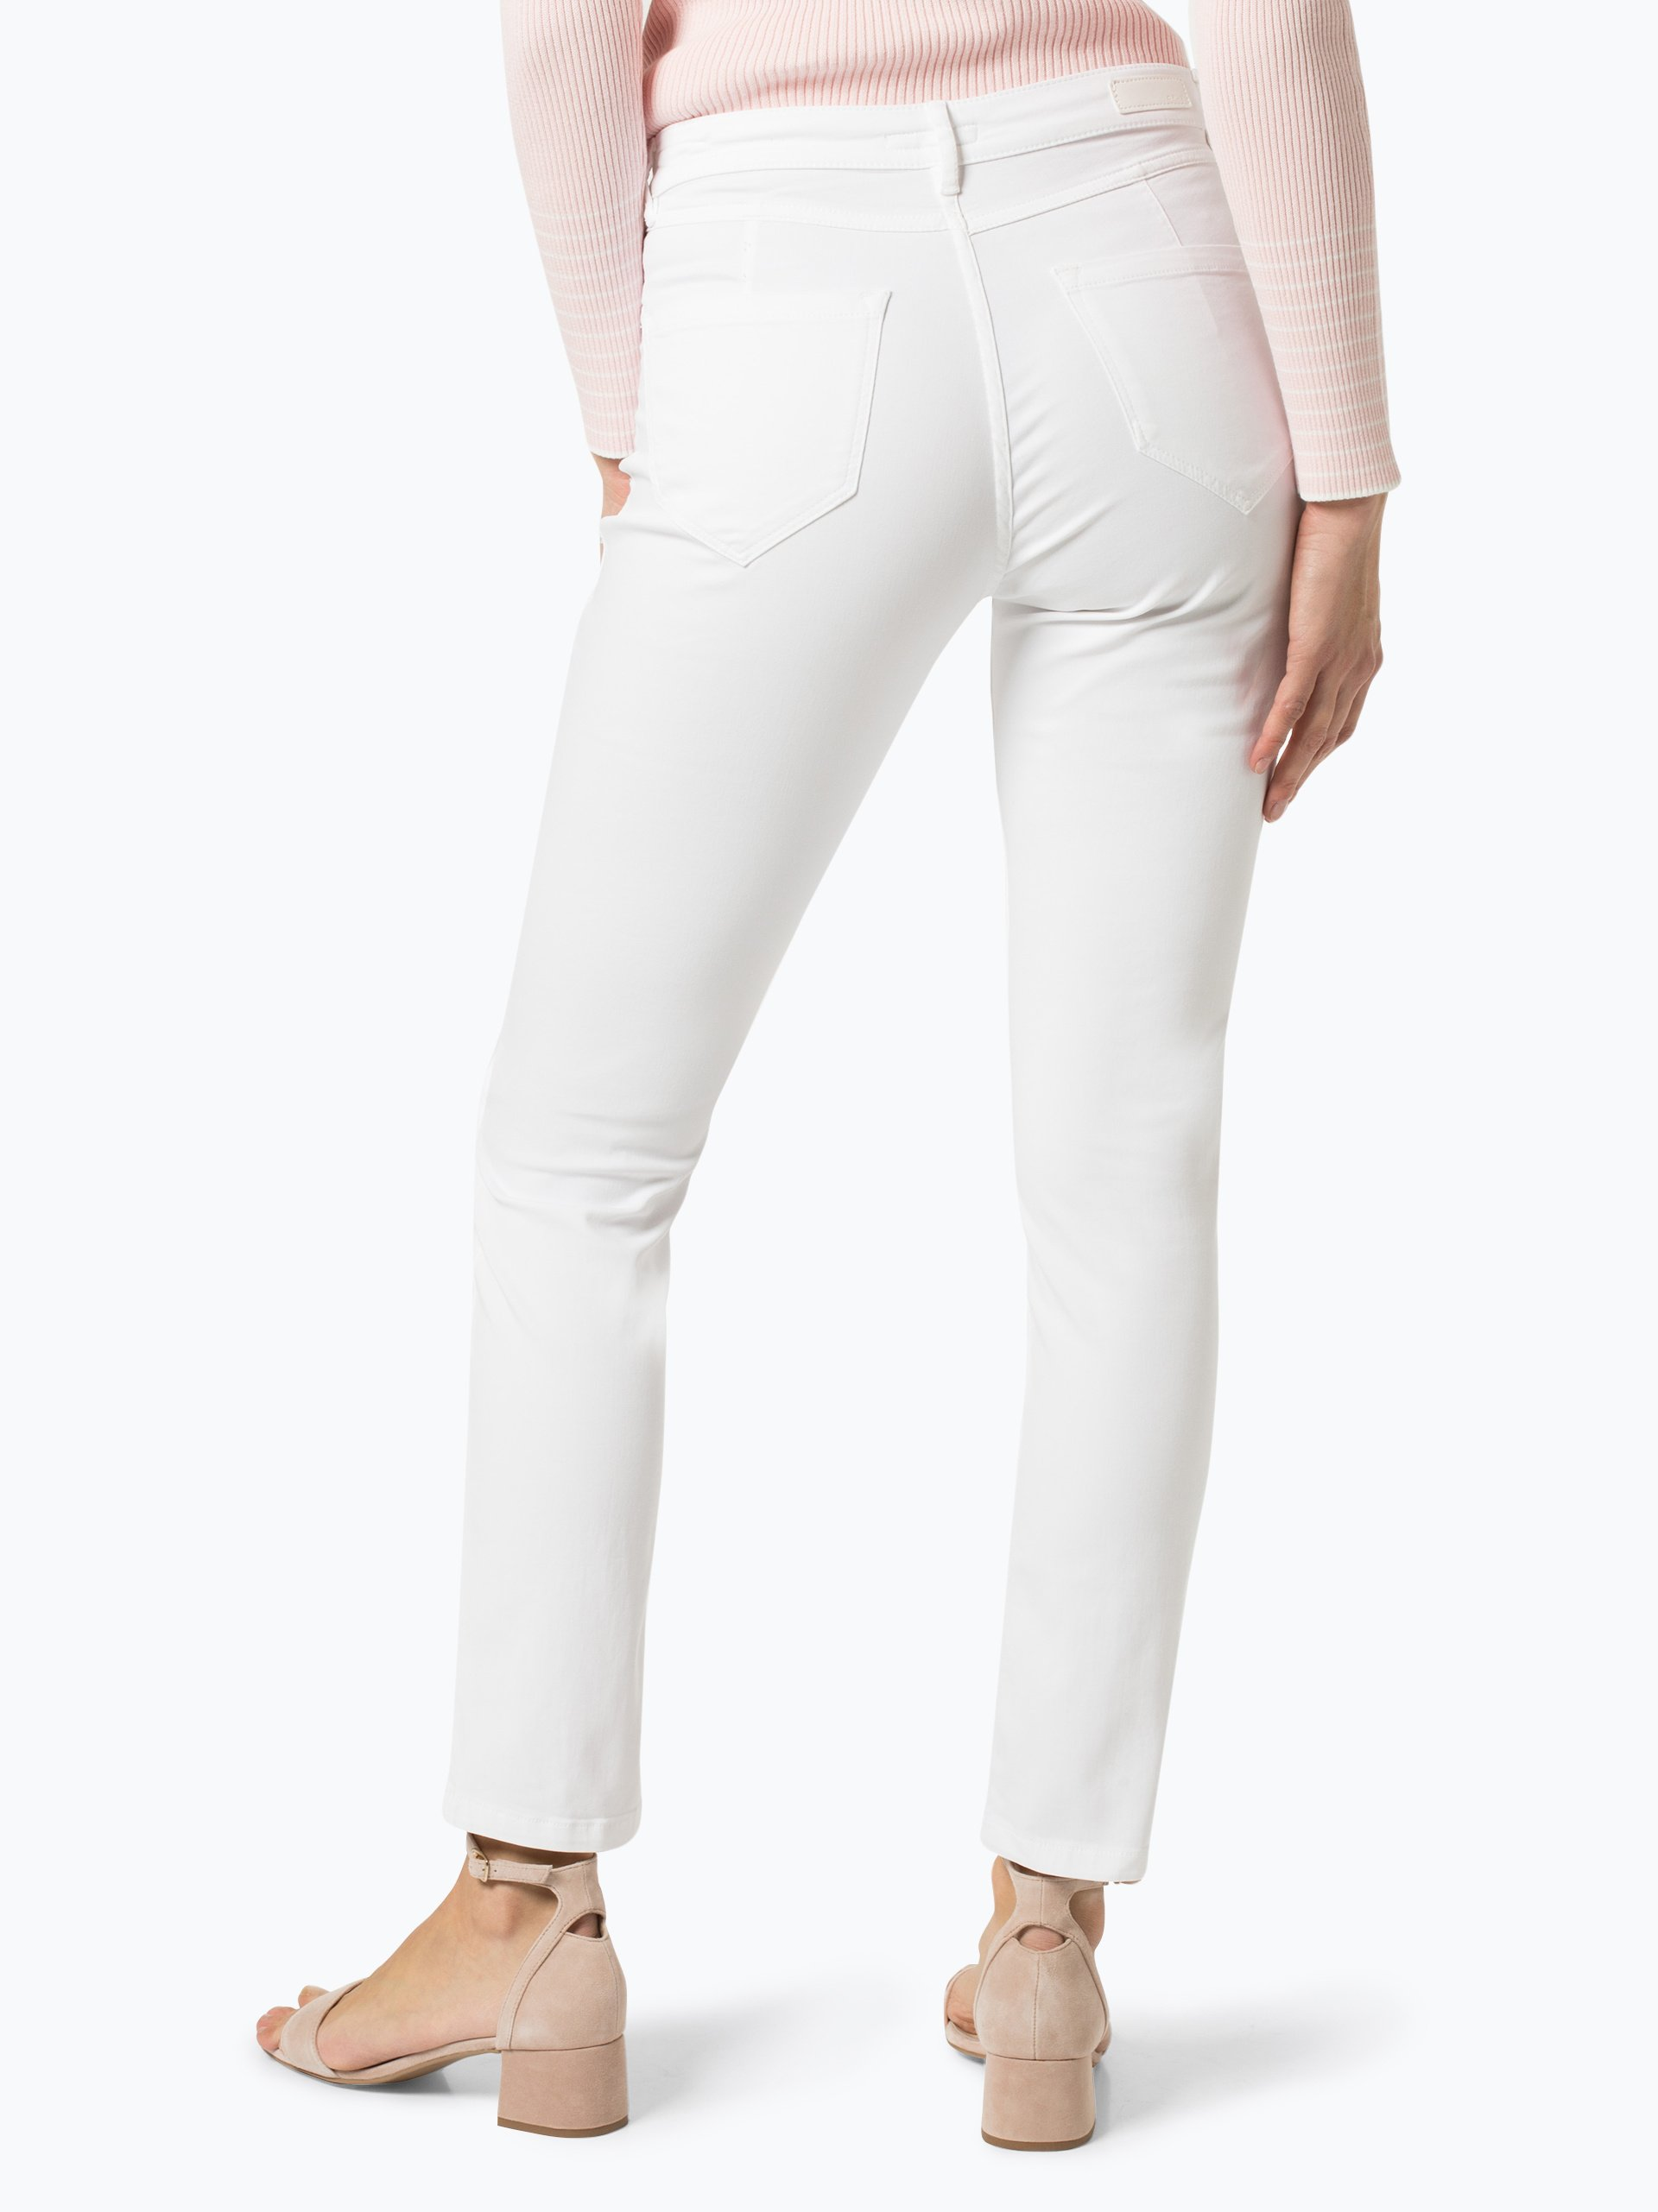 Opus Spodnie damskie – Emily Satin Stripe